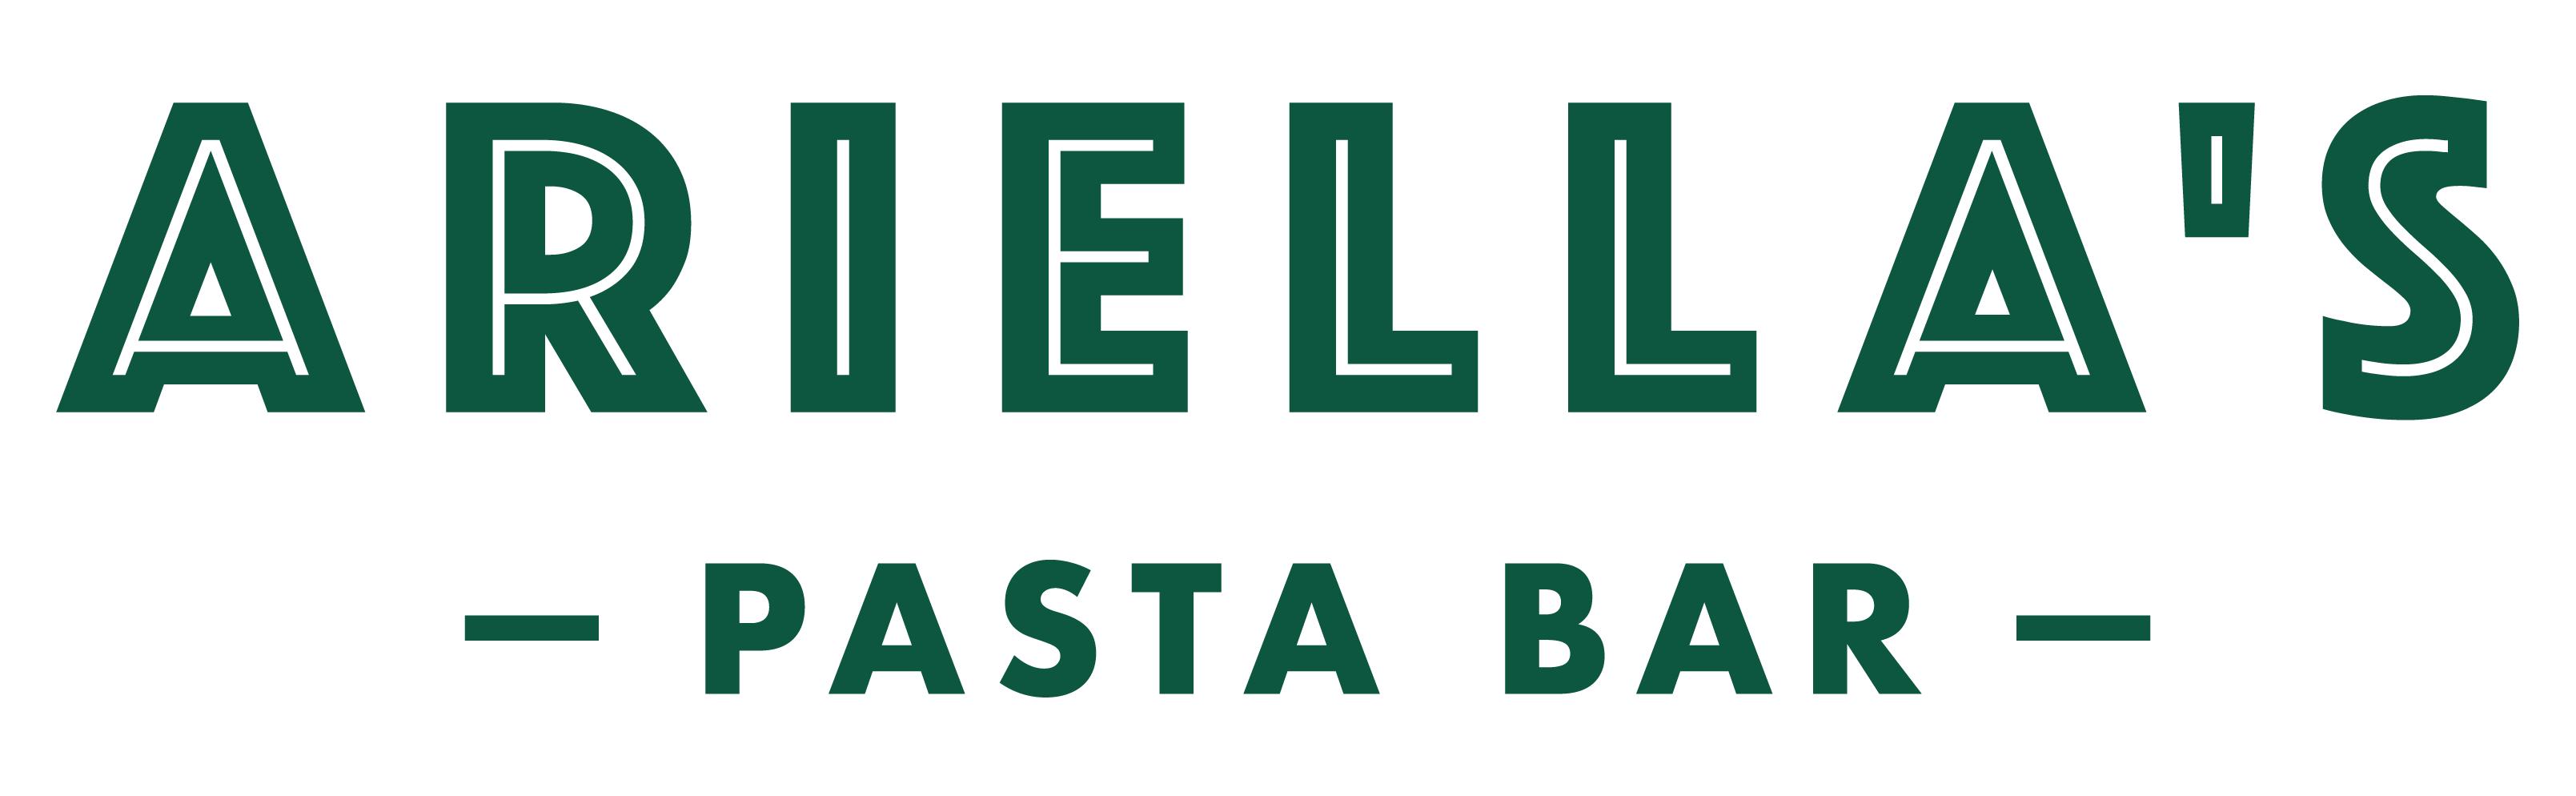 Ariella's Pasta Bar